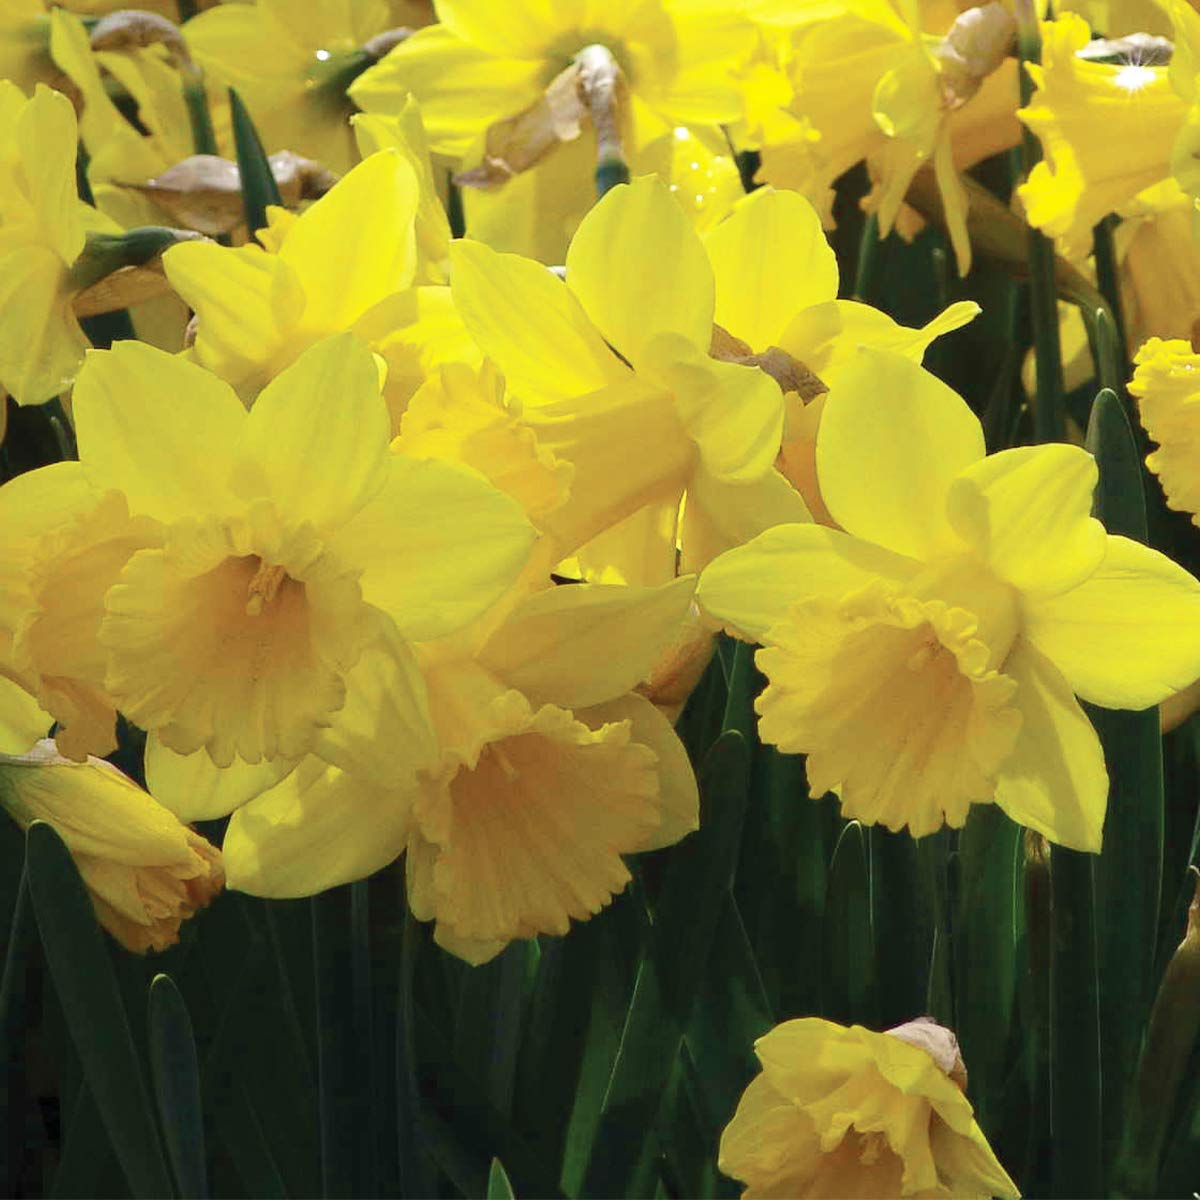 Burpee Trumpet Daffodil - 150 Flower Bulbs   Yellow